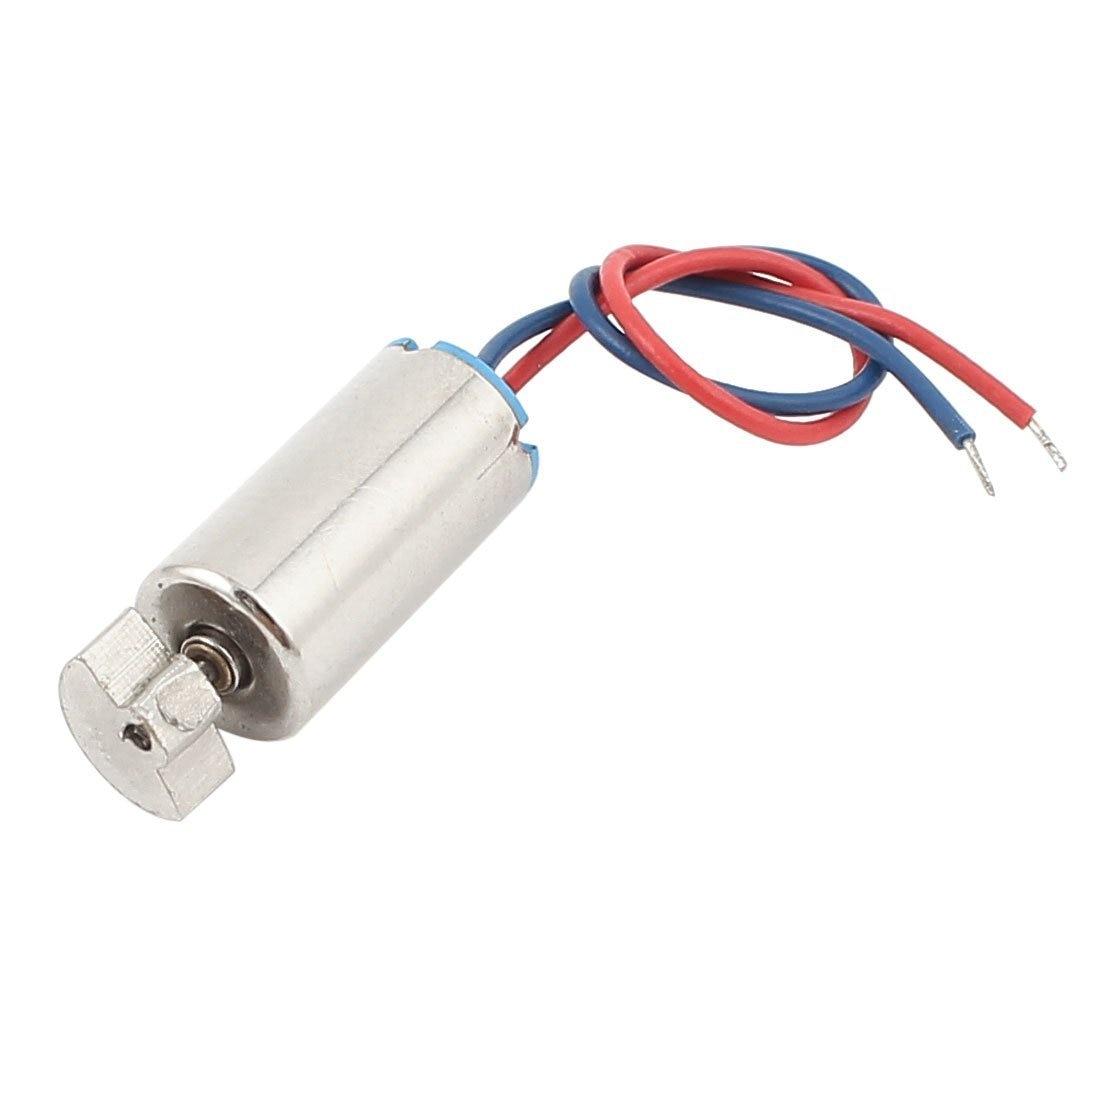 porn-oral-miniature-vibrator-motor-young